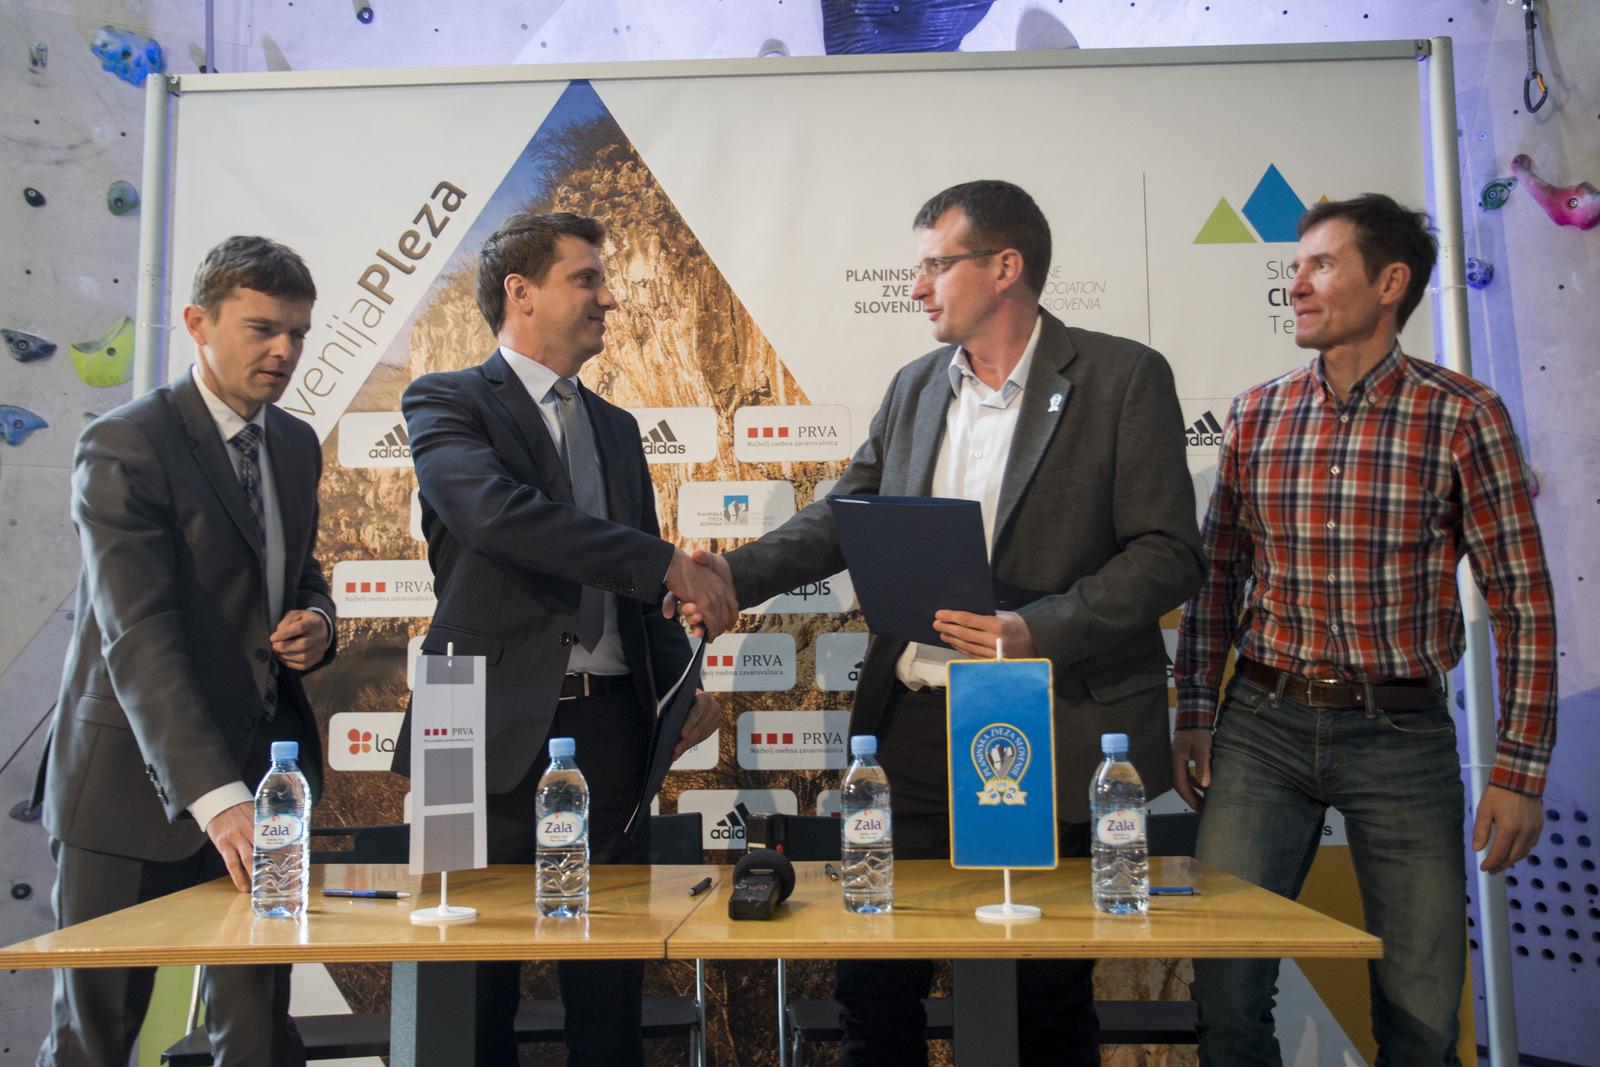 SlovenijaPleza2018_podpis_pogodbe_1_UU